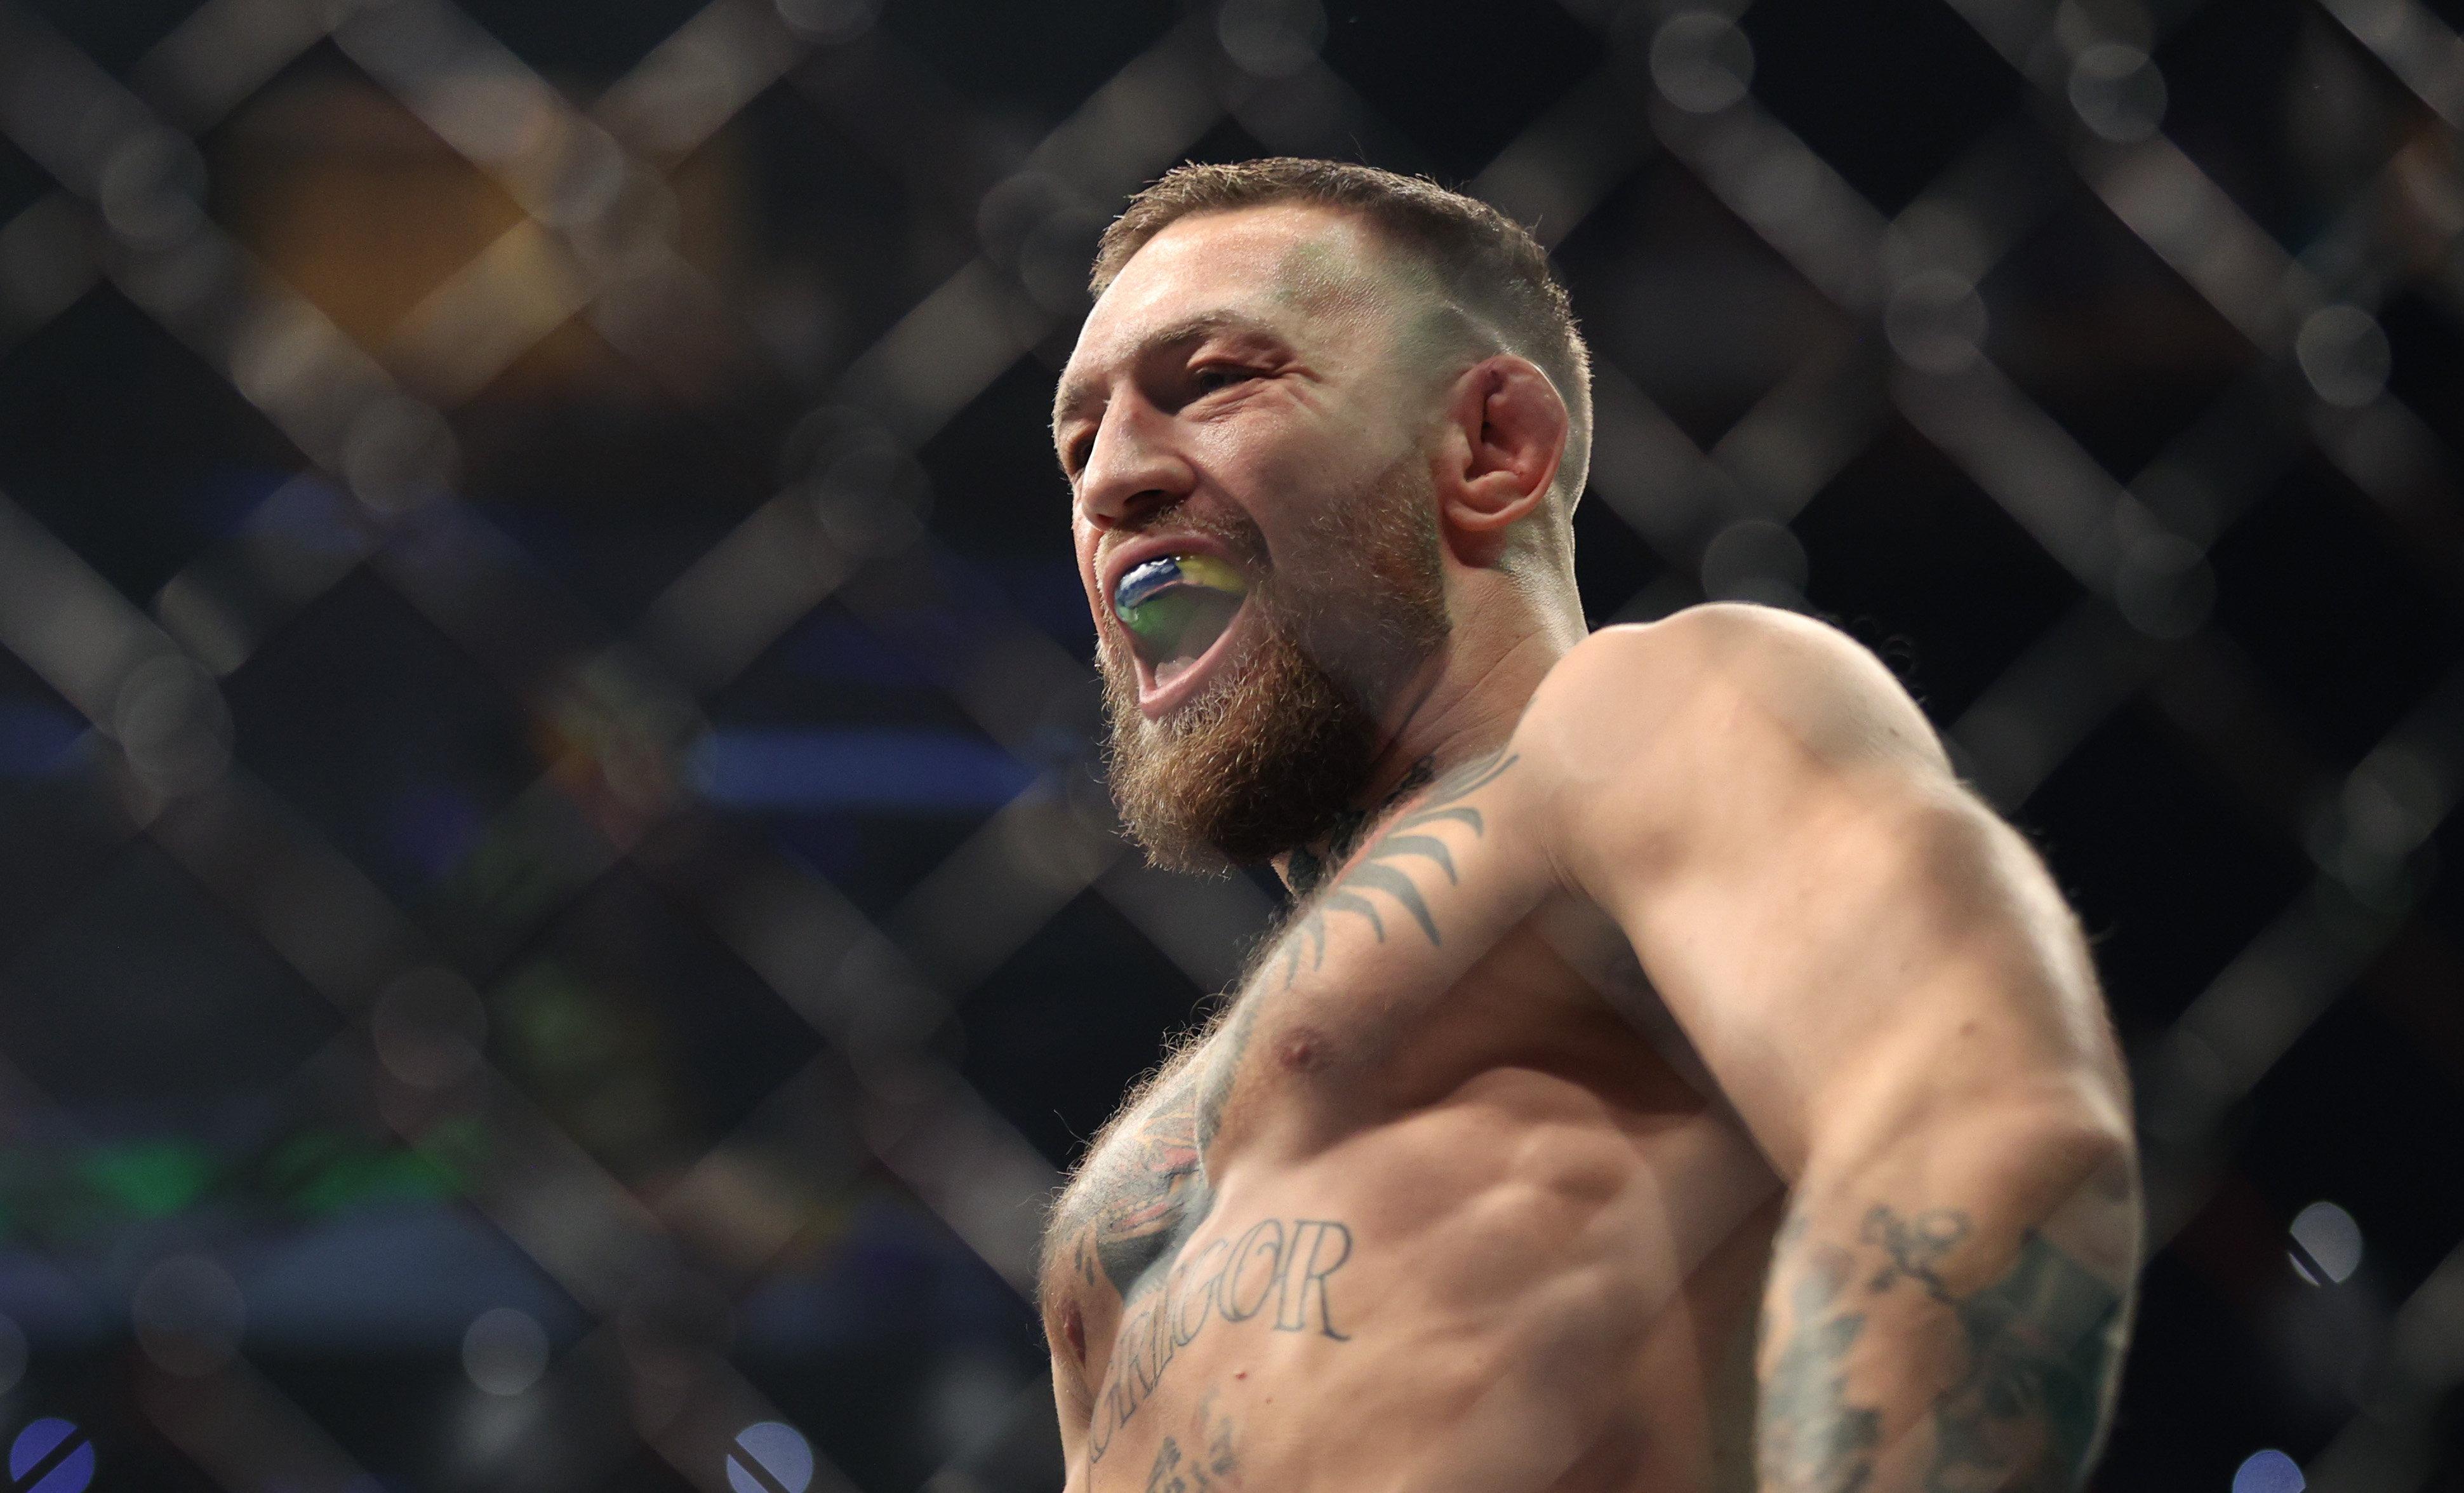 Conor McGregor during his UFC 264 headliner with Dustin Poirier.